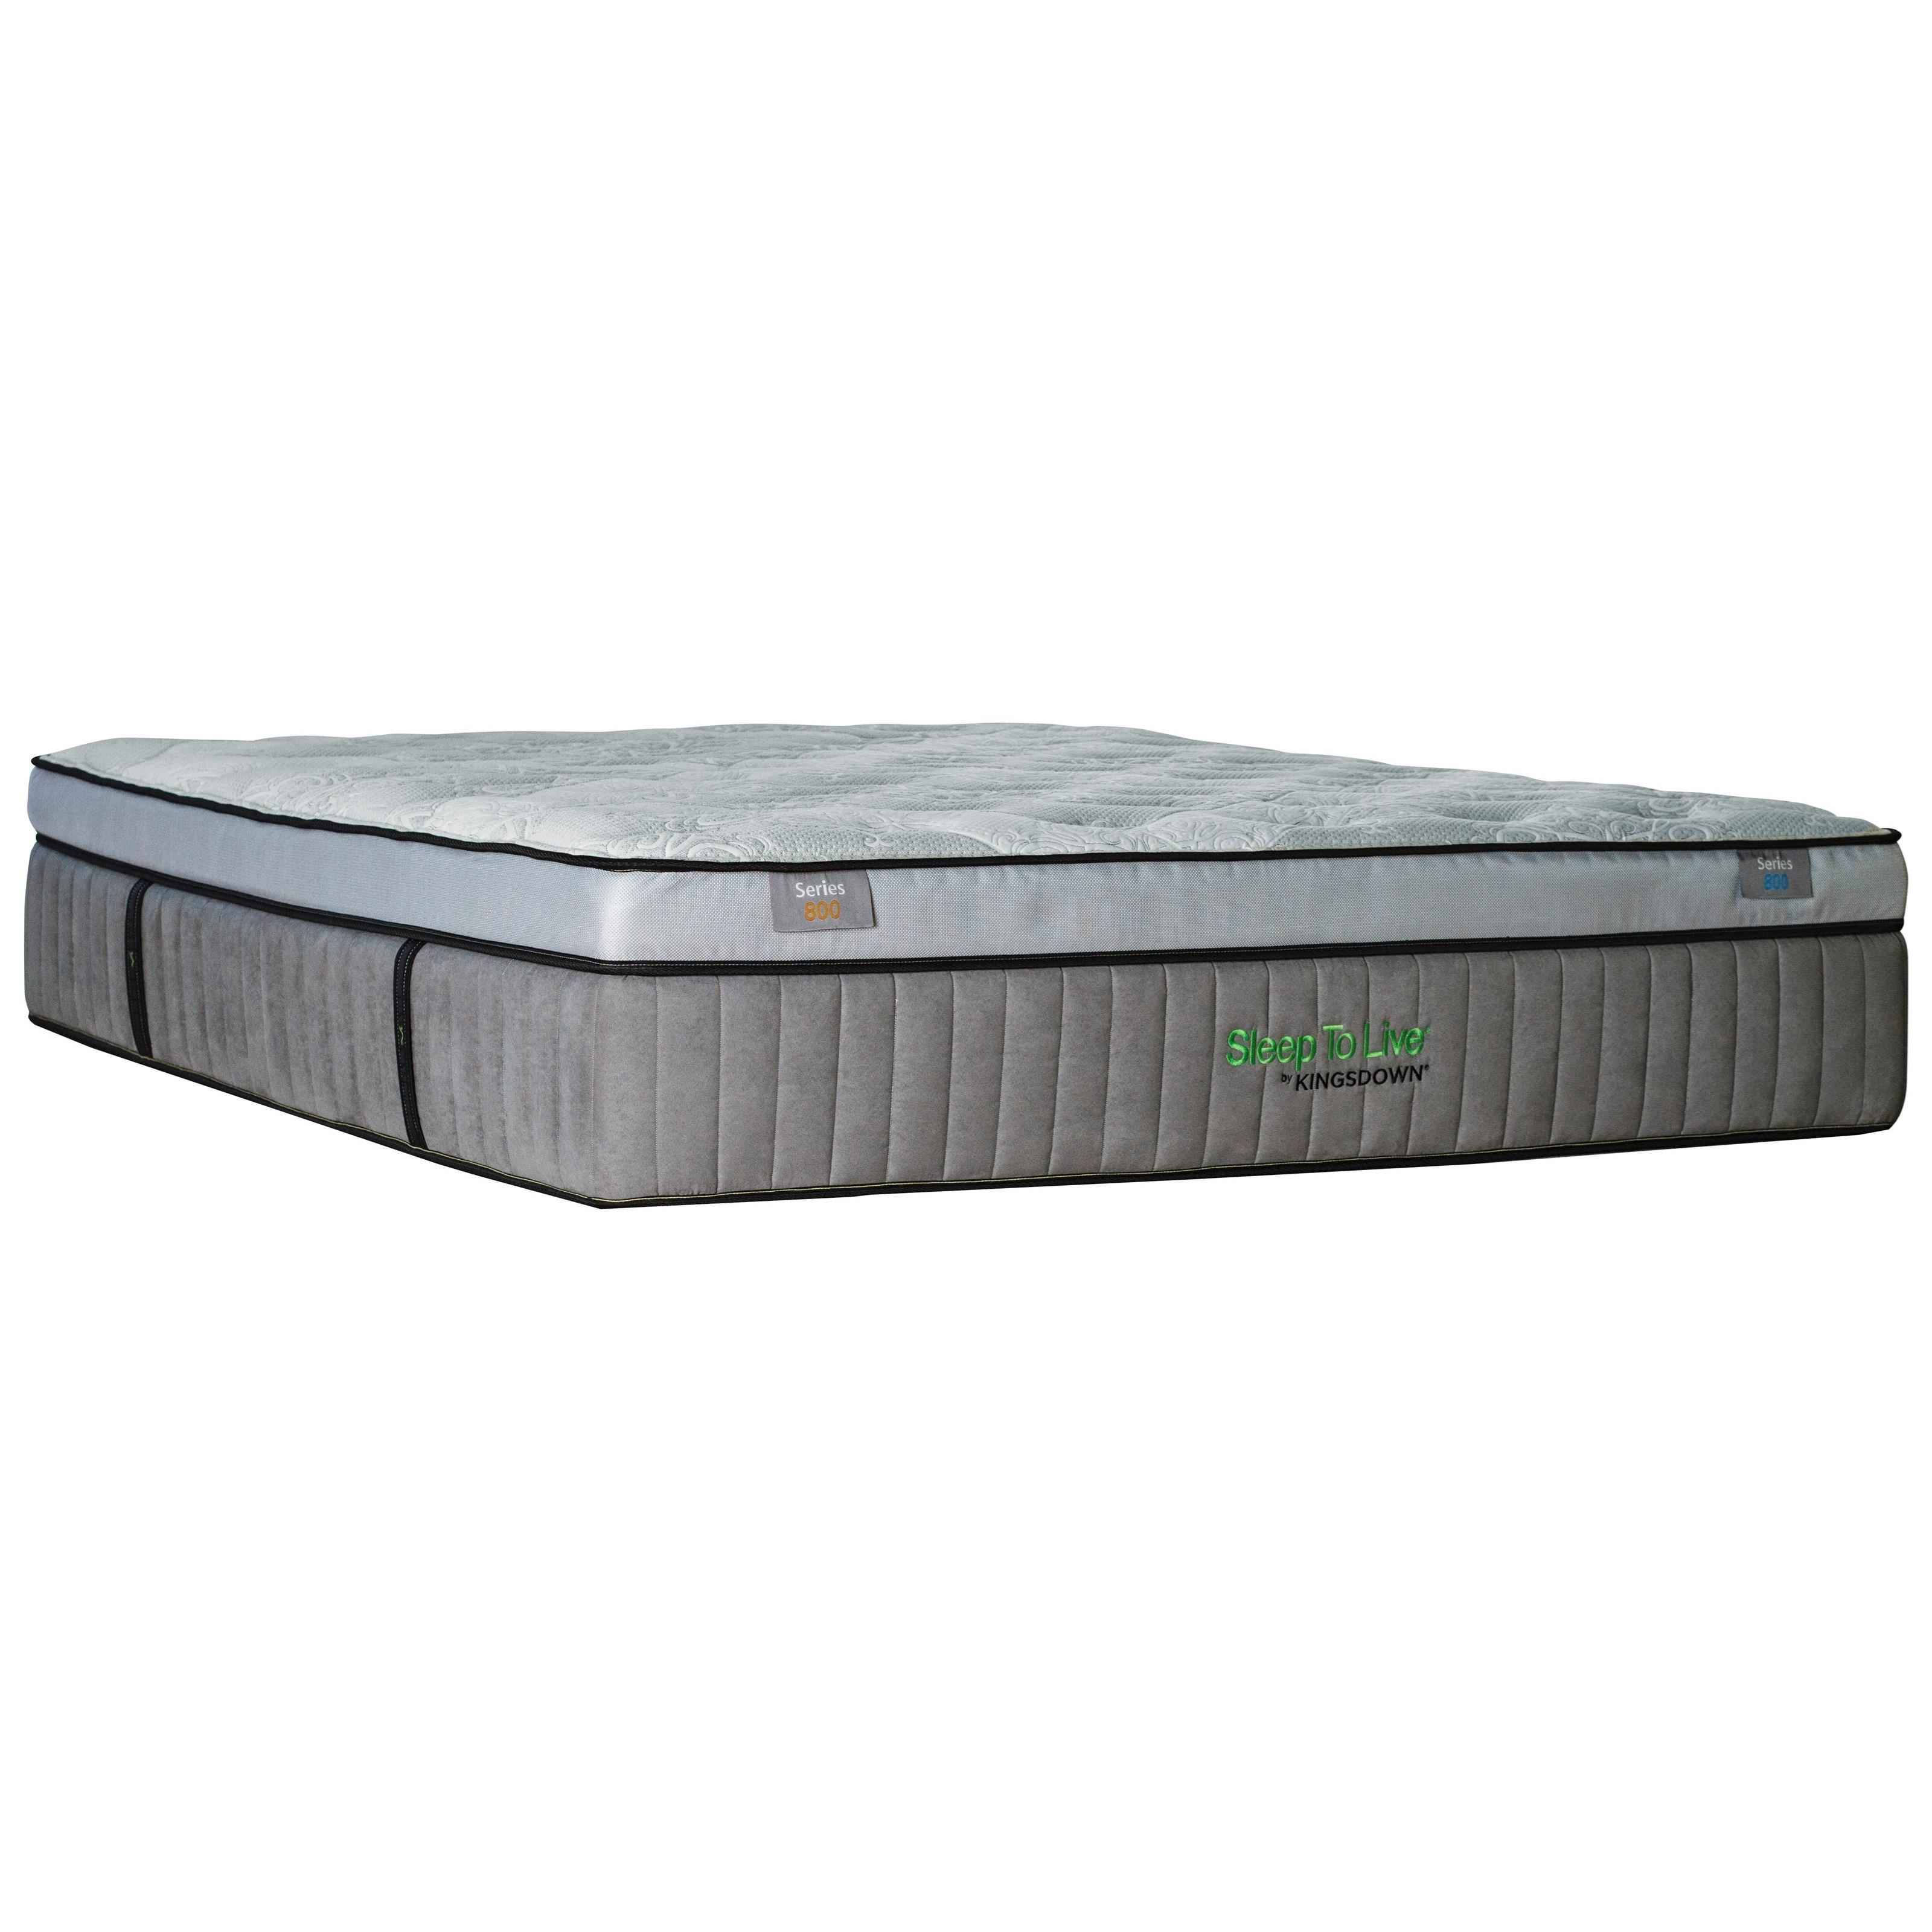 "5254 Green Series 800 Twin XL 16 1/2"" Plush Box Top Mattress by Kingsdown at Goods Furniture"